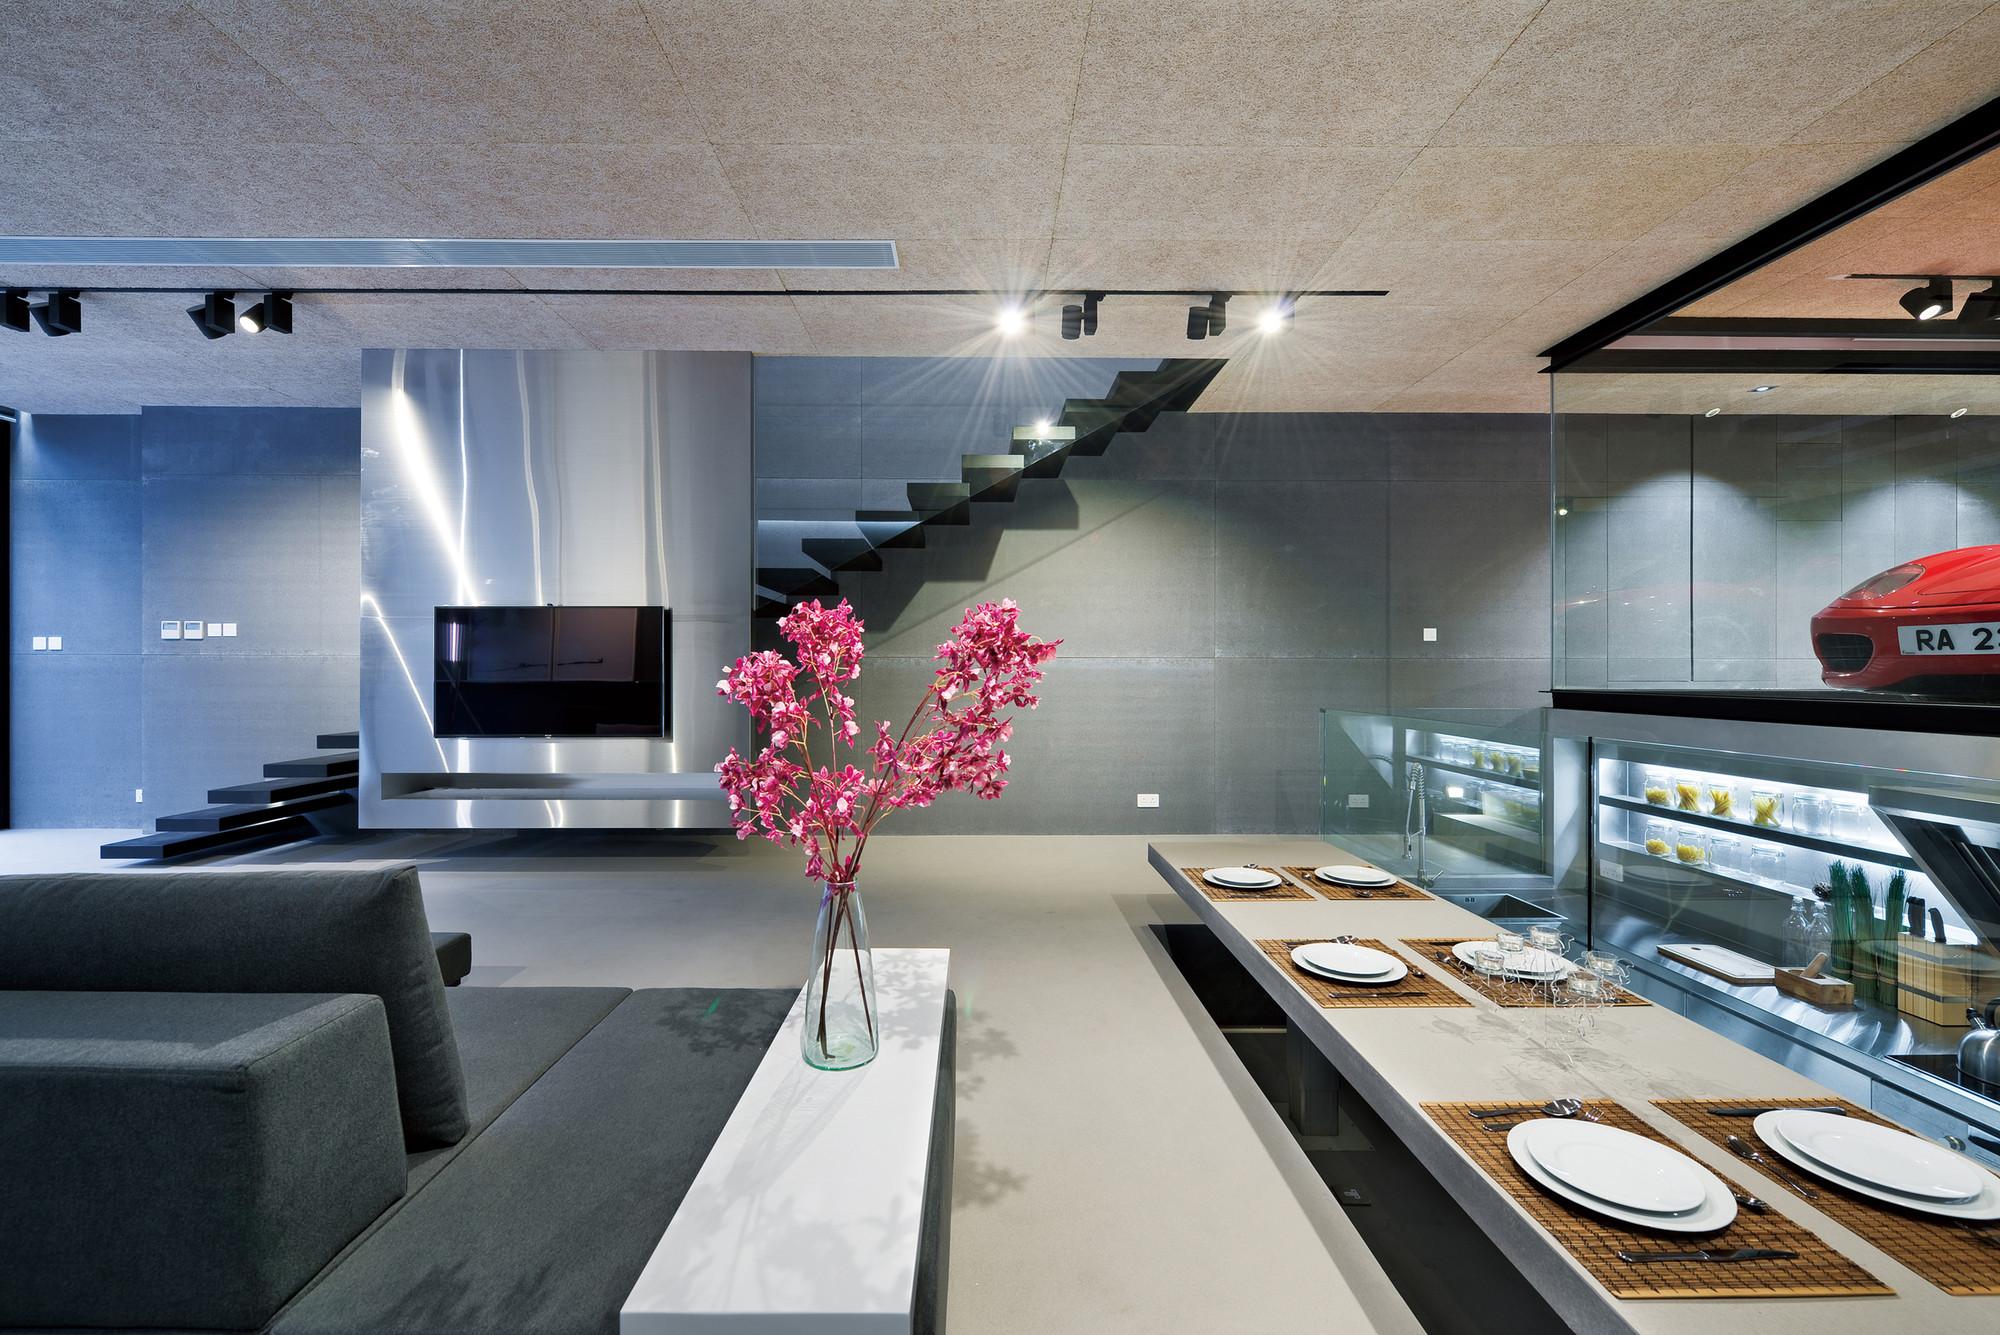 House Design on Flipboard